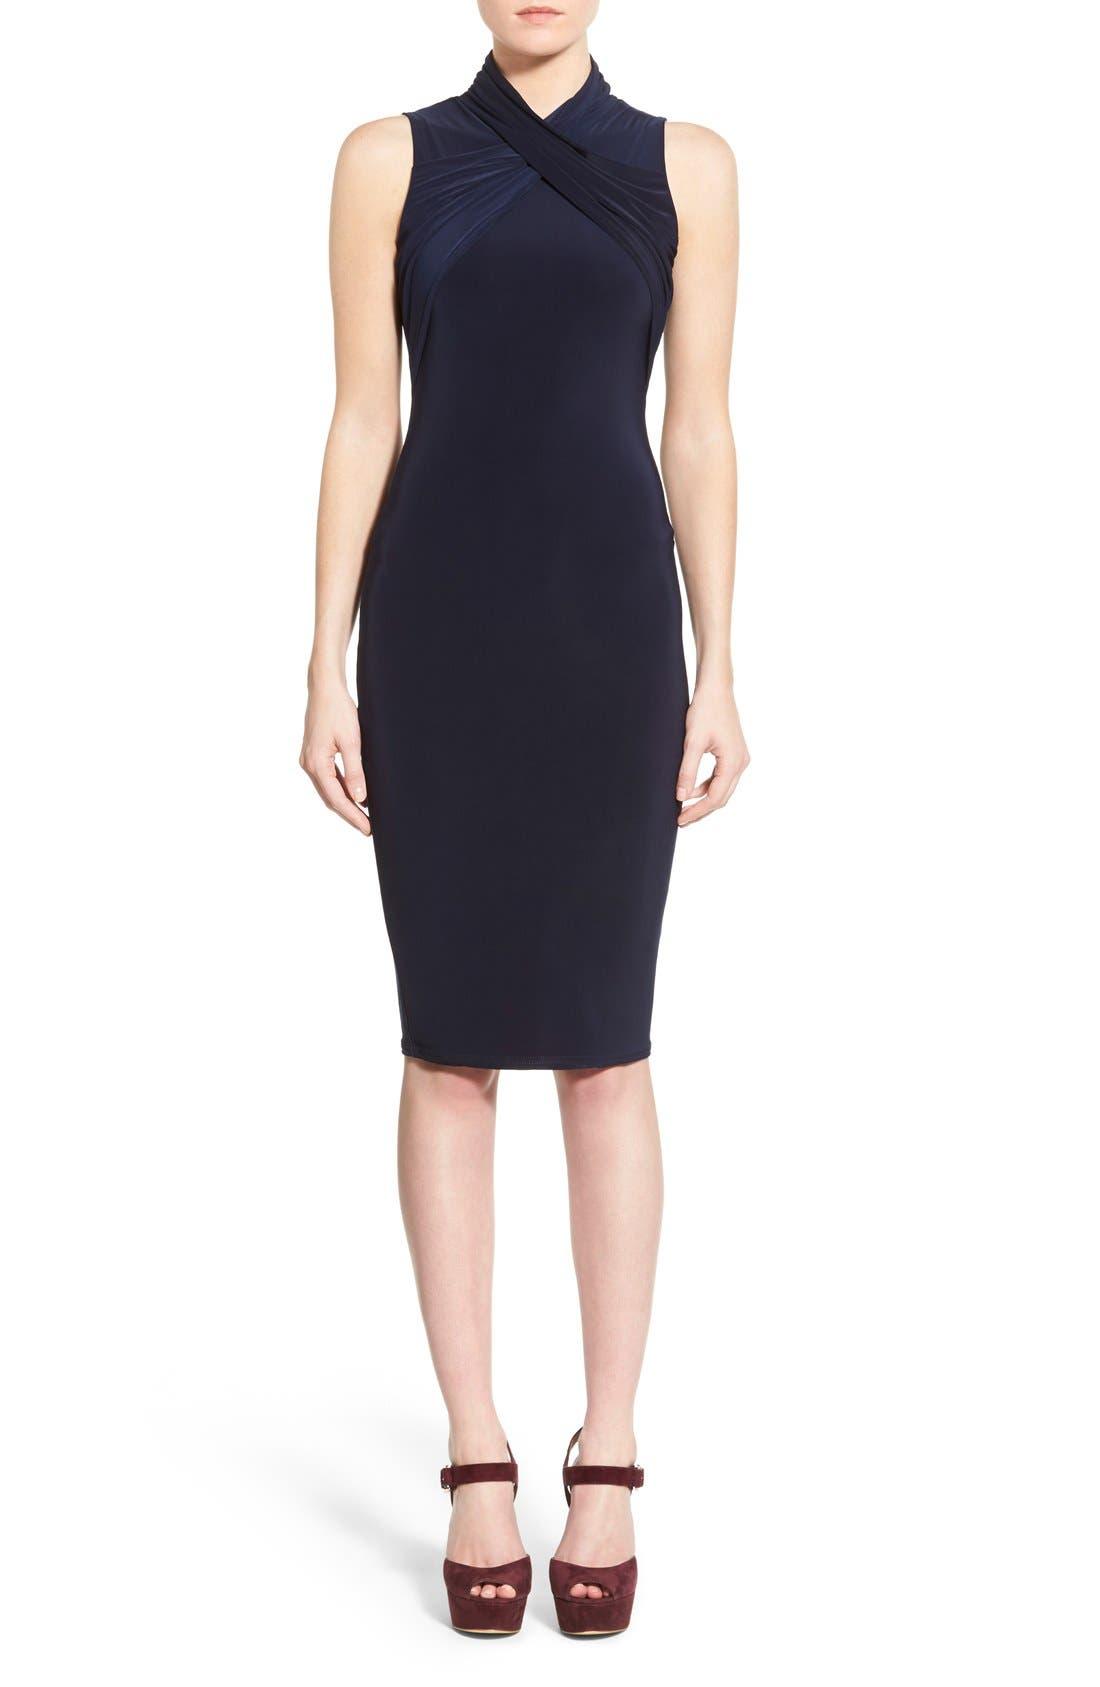 Main Image - Missguided Twist Neck Body-Con Dress